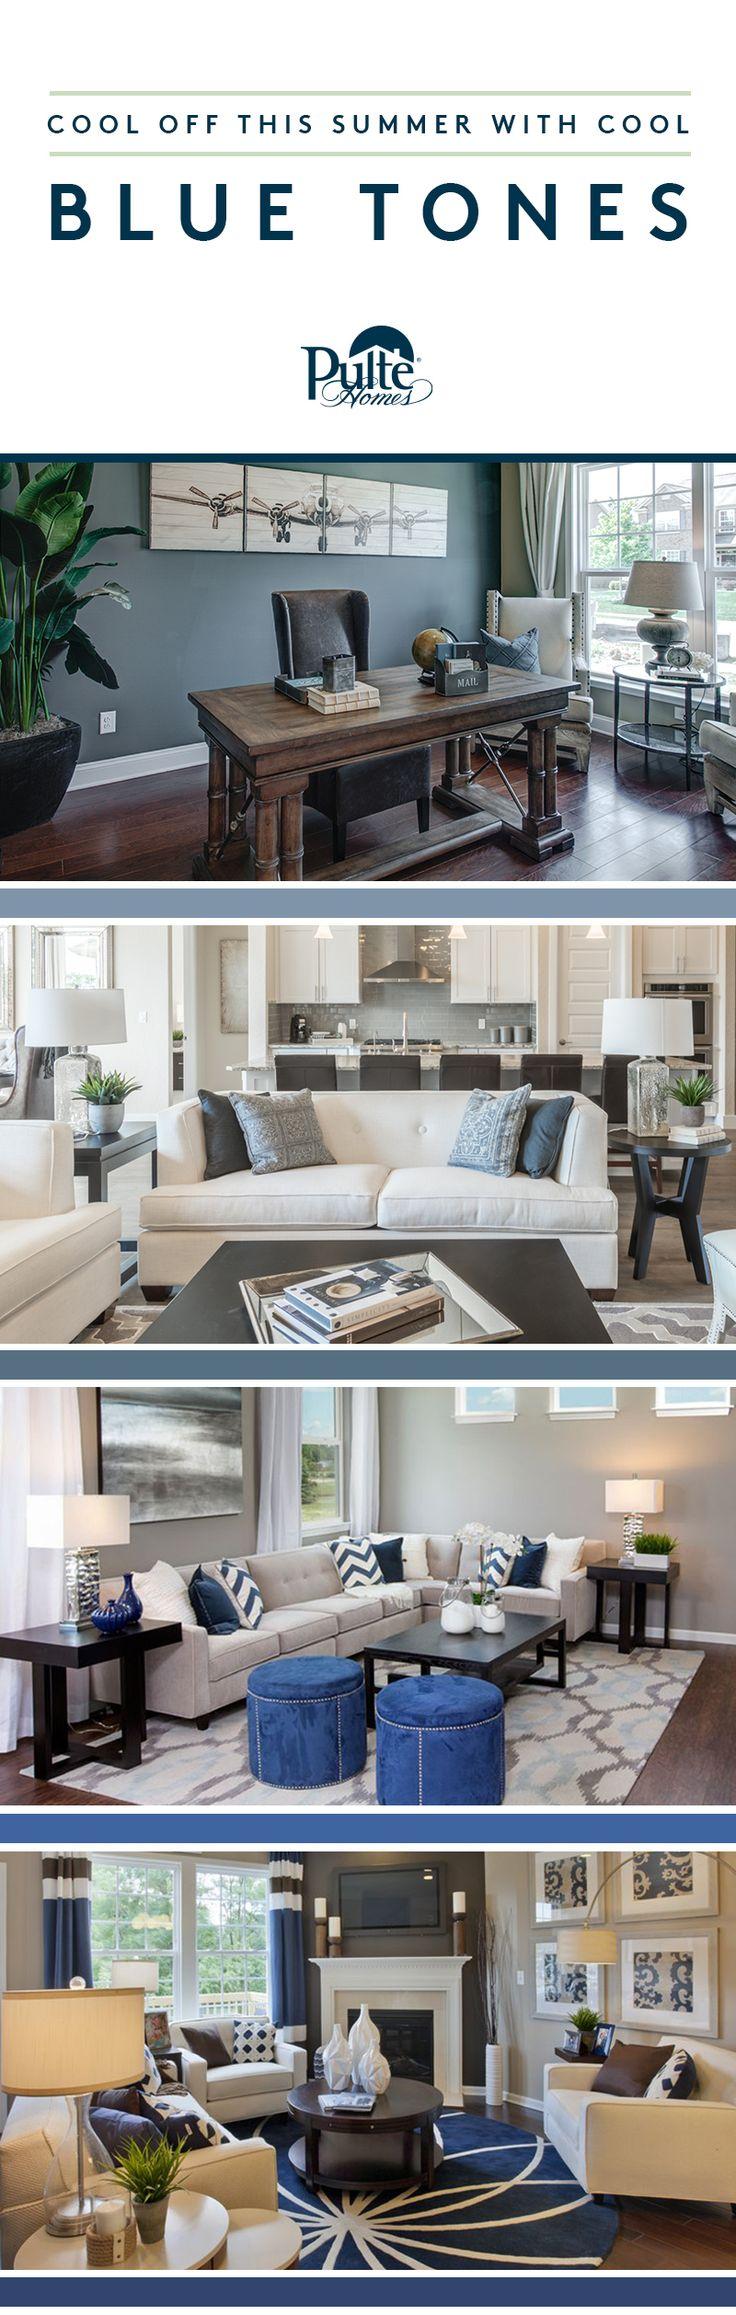 Best Ideas About Pulte Homes On Pinterest Closet Ideas Walk - Pulte homes design center